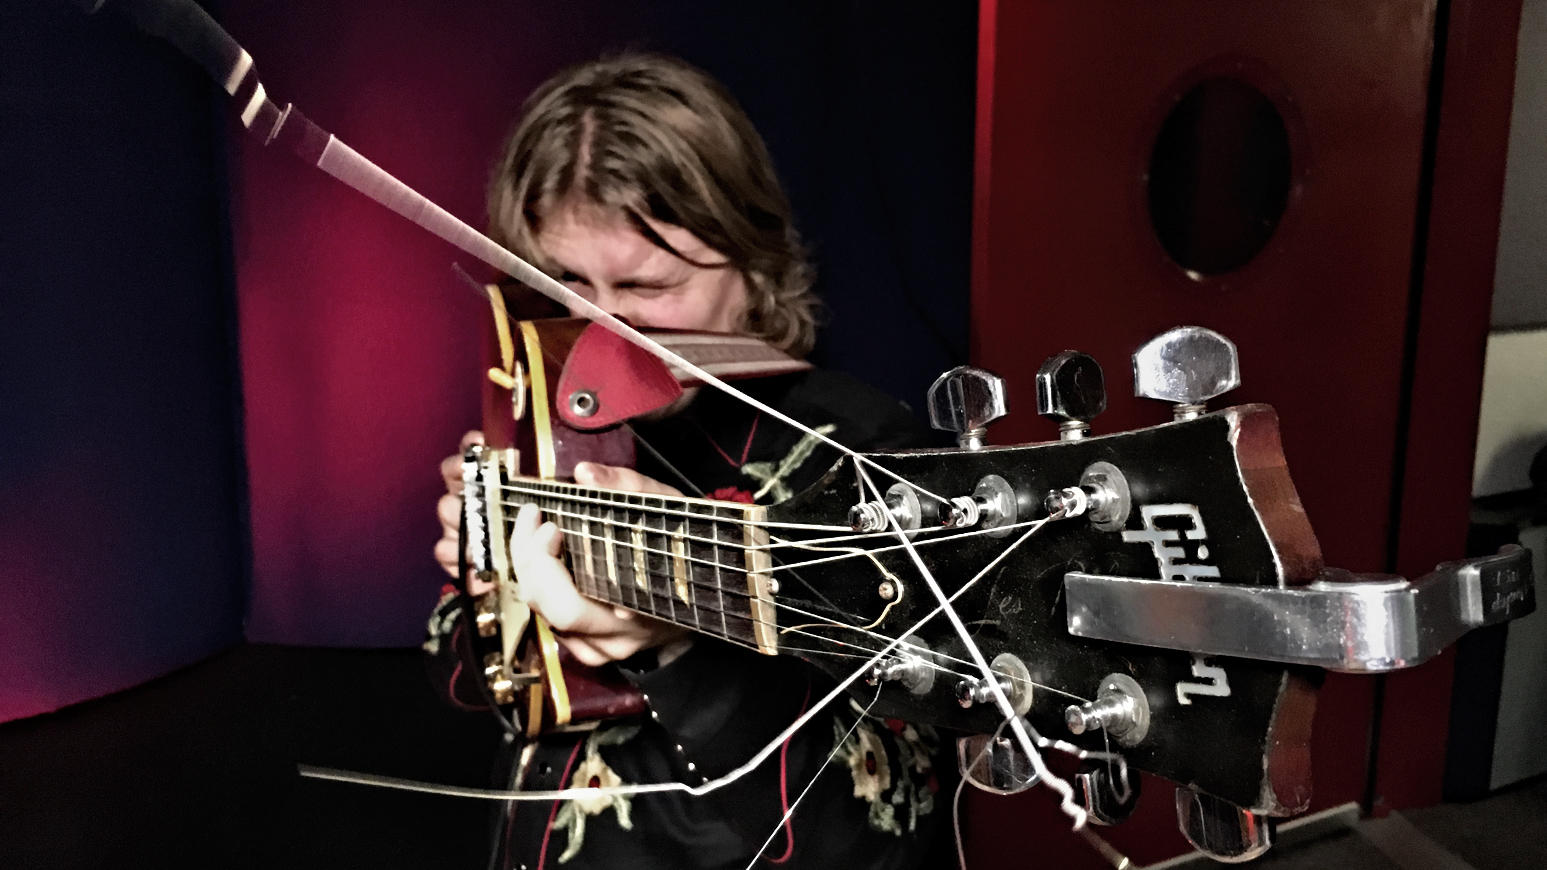 Ty Segall Break A Guitar Live Kuac